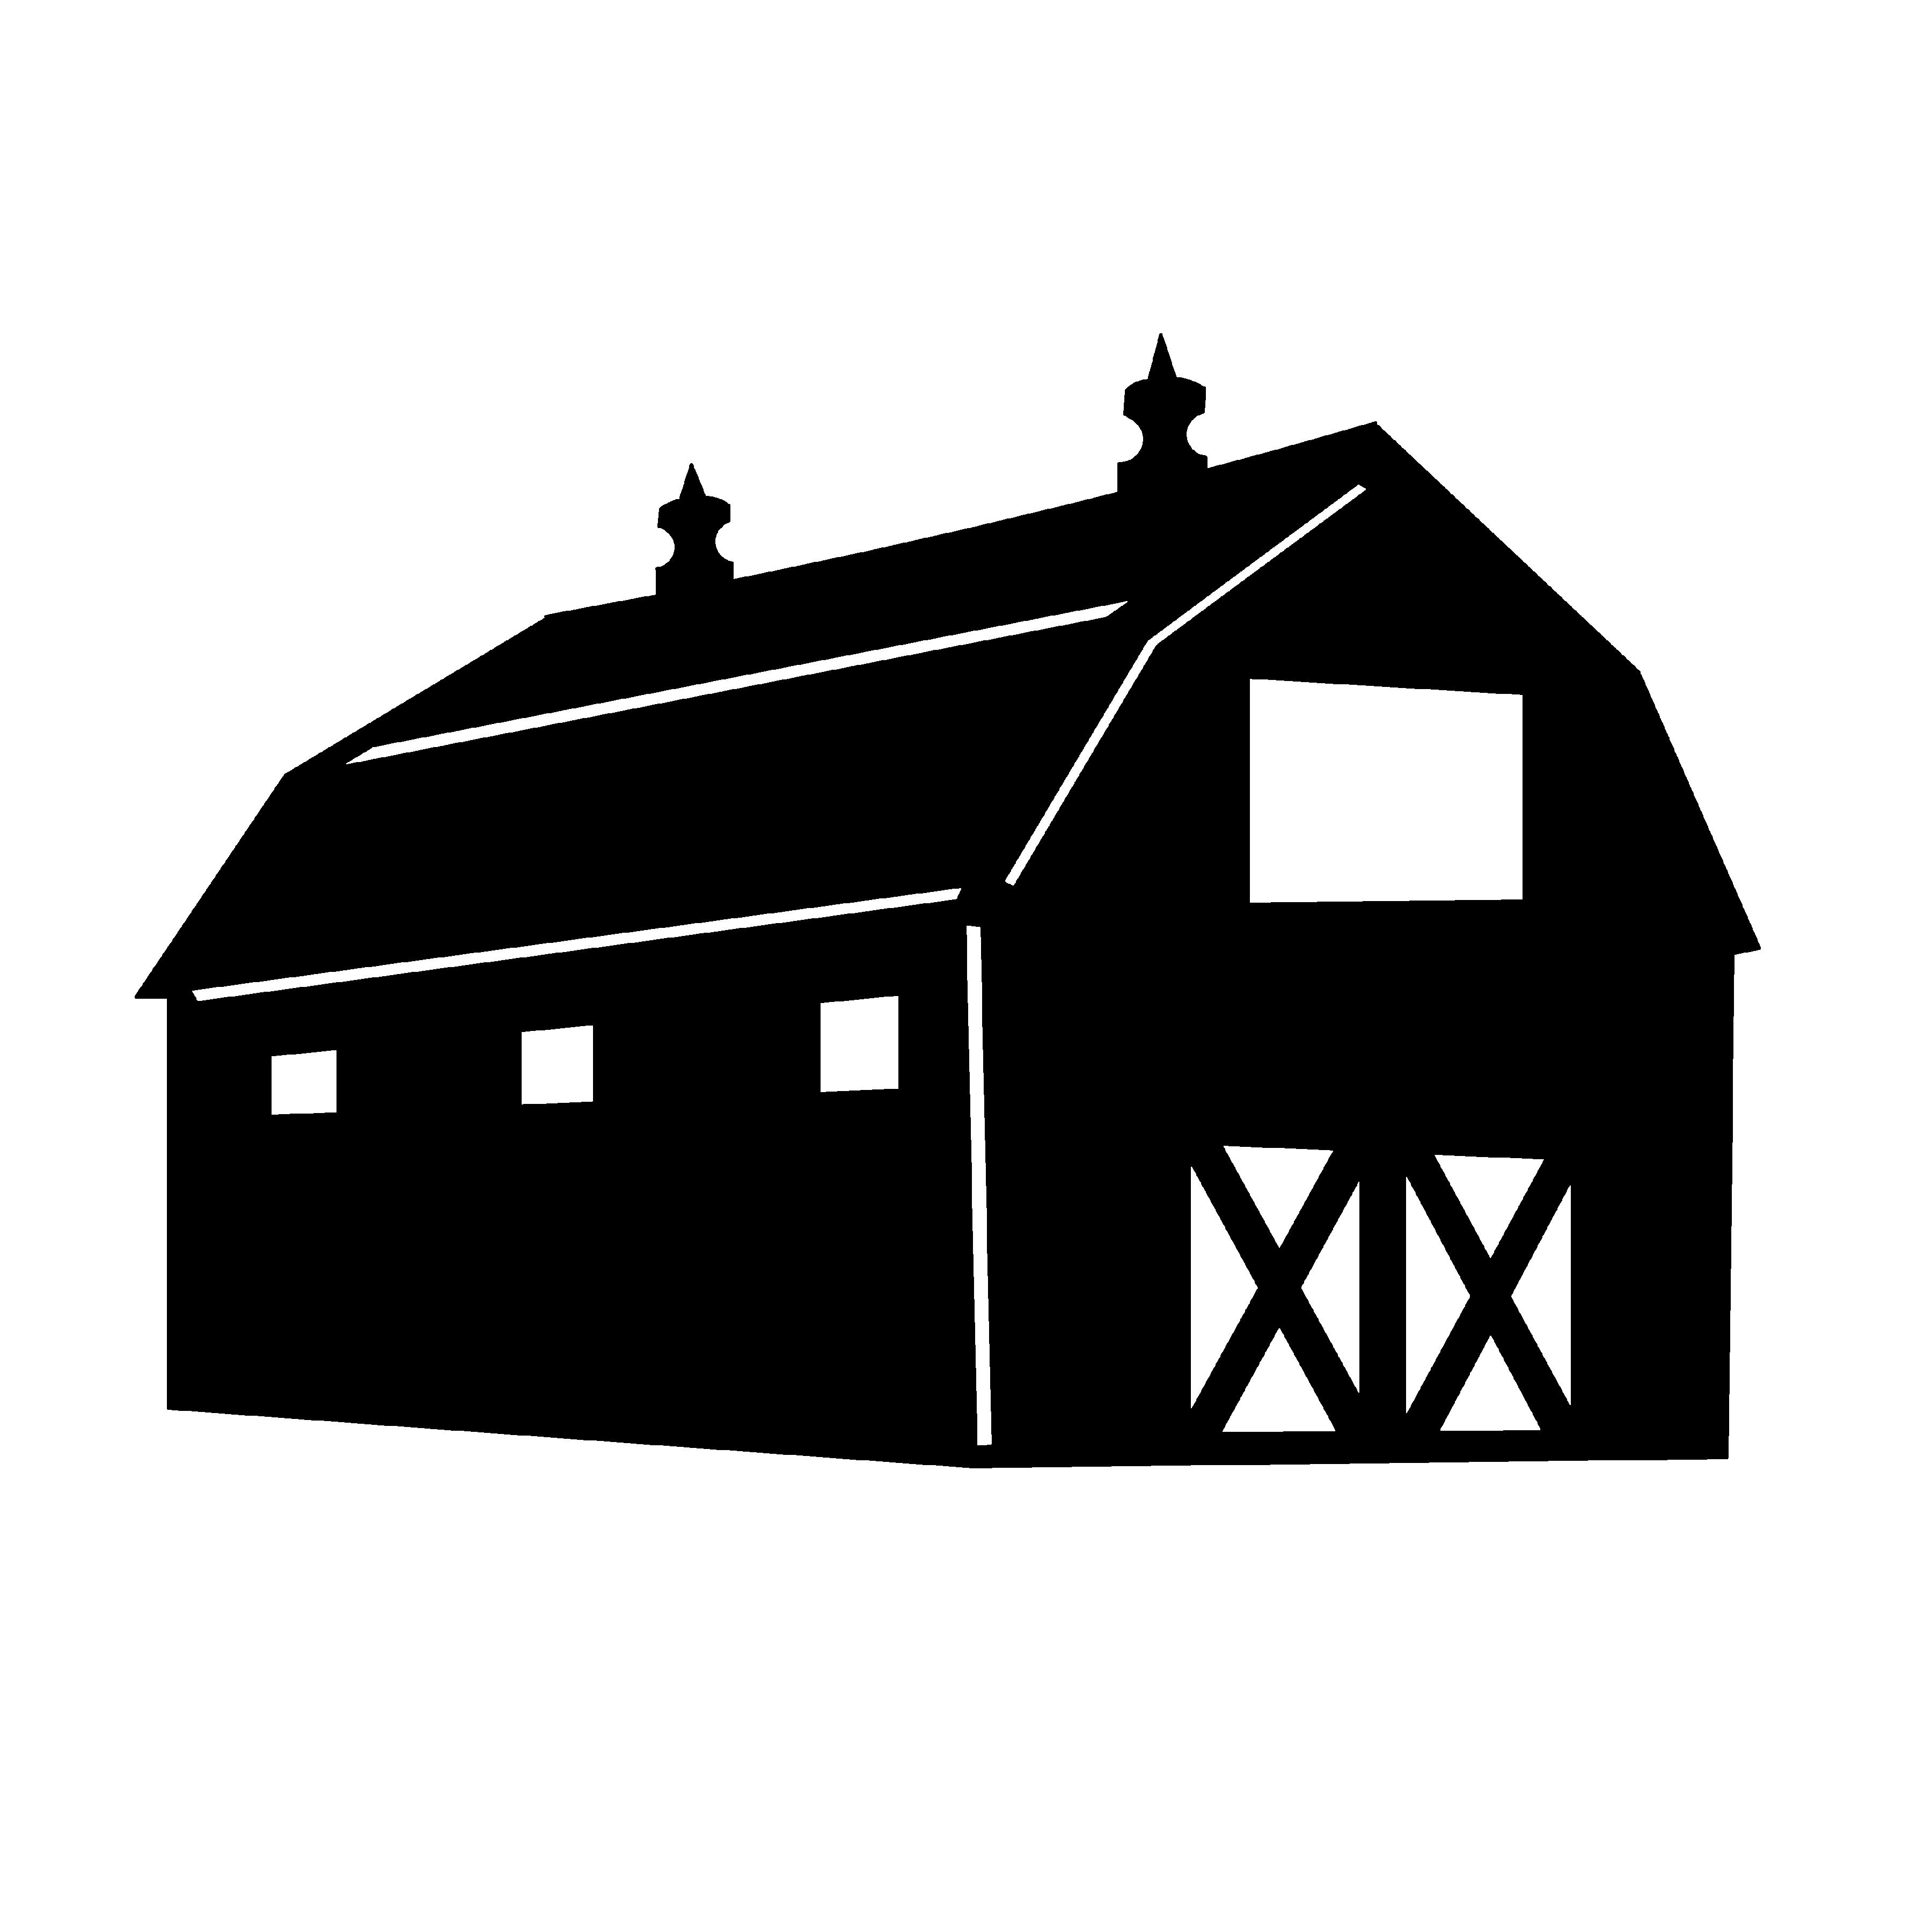 3600x3600 Enjoyable Farm Silhouette Clip Art Clipart Library